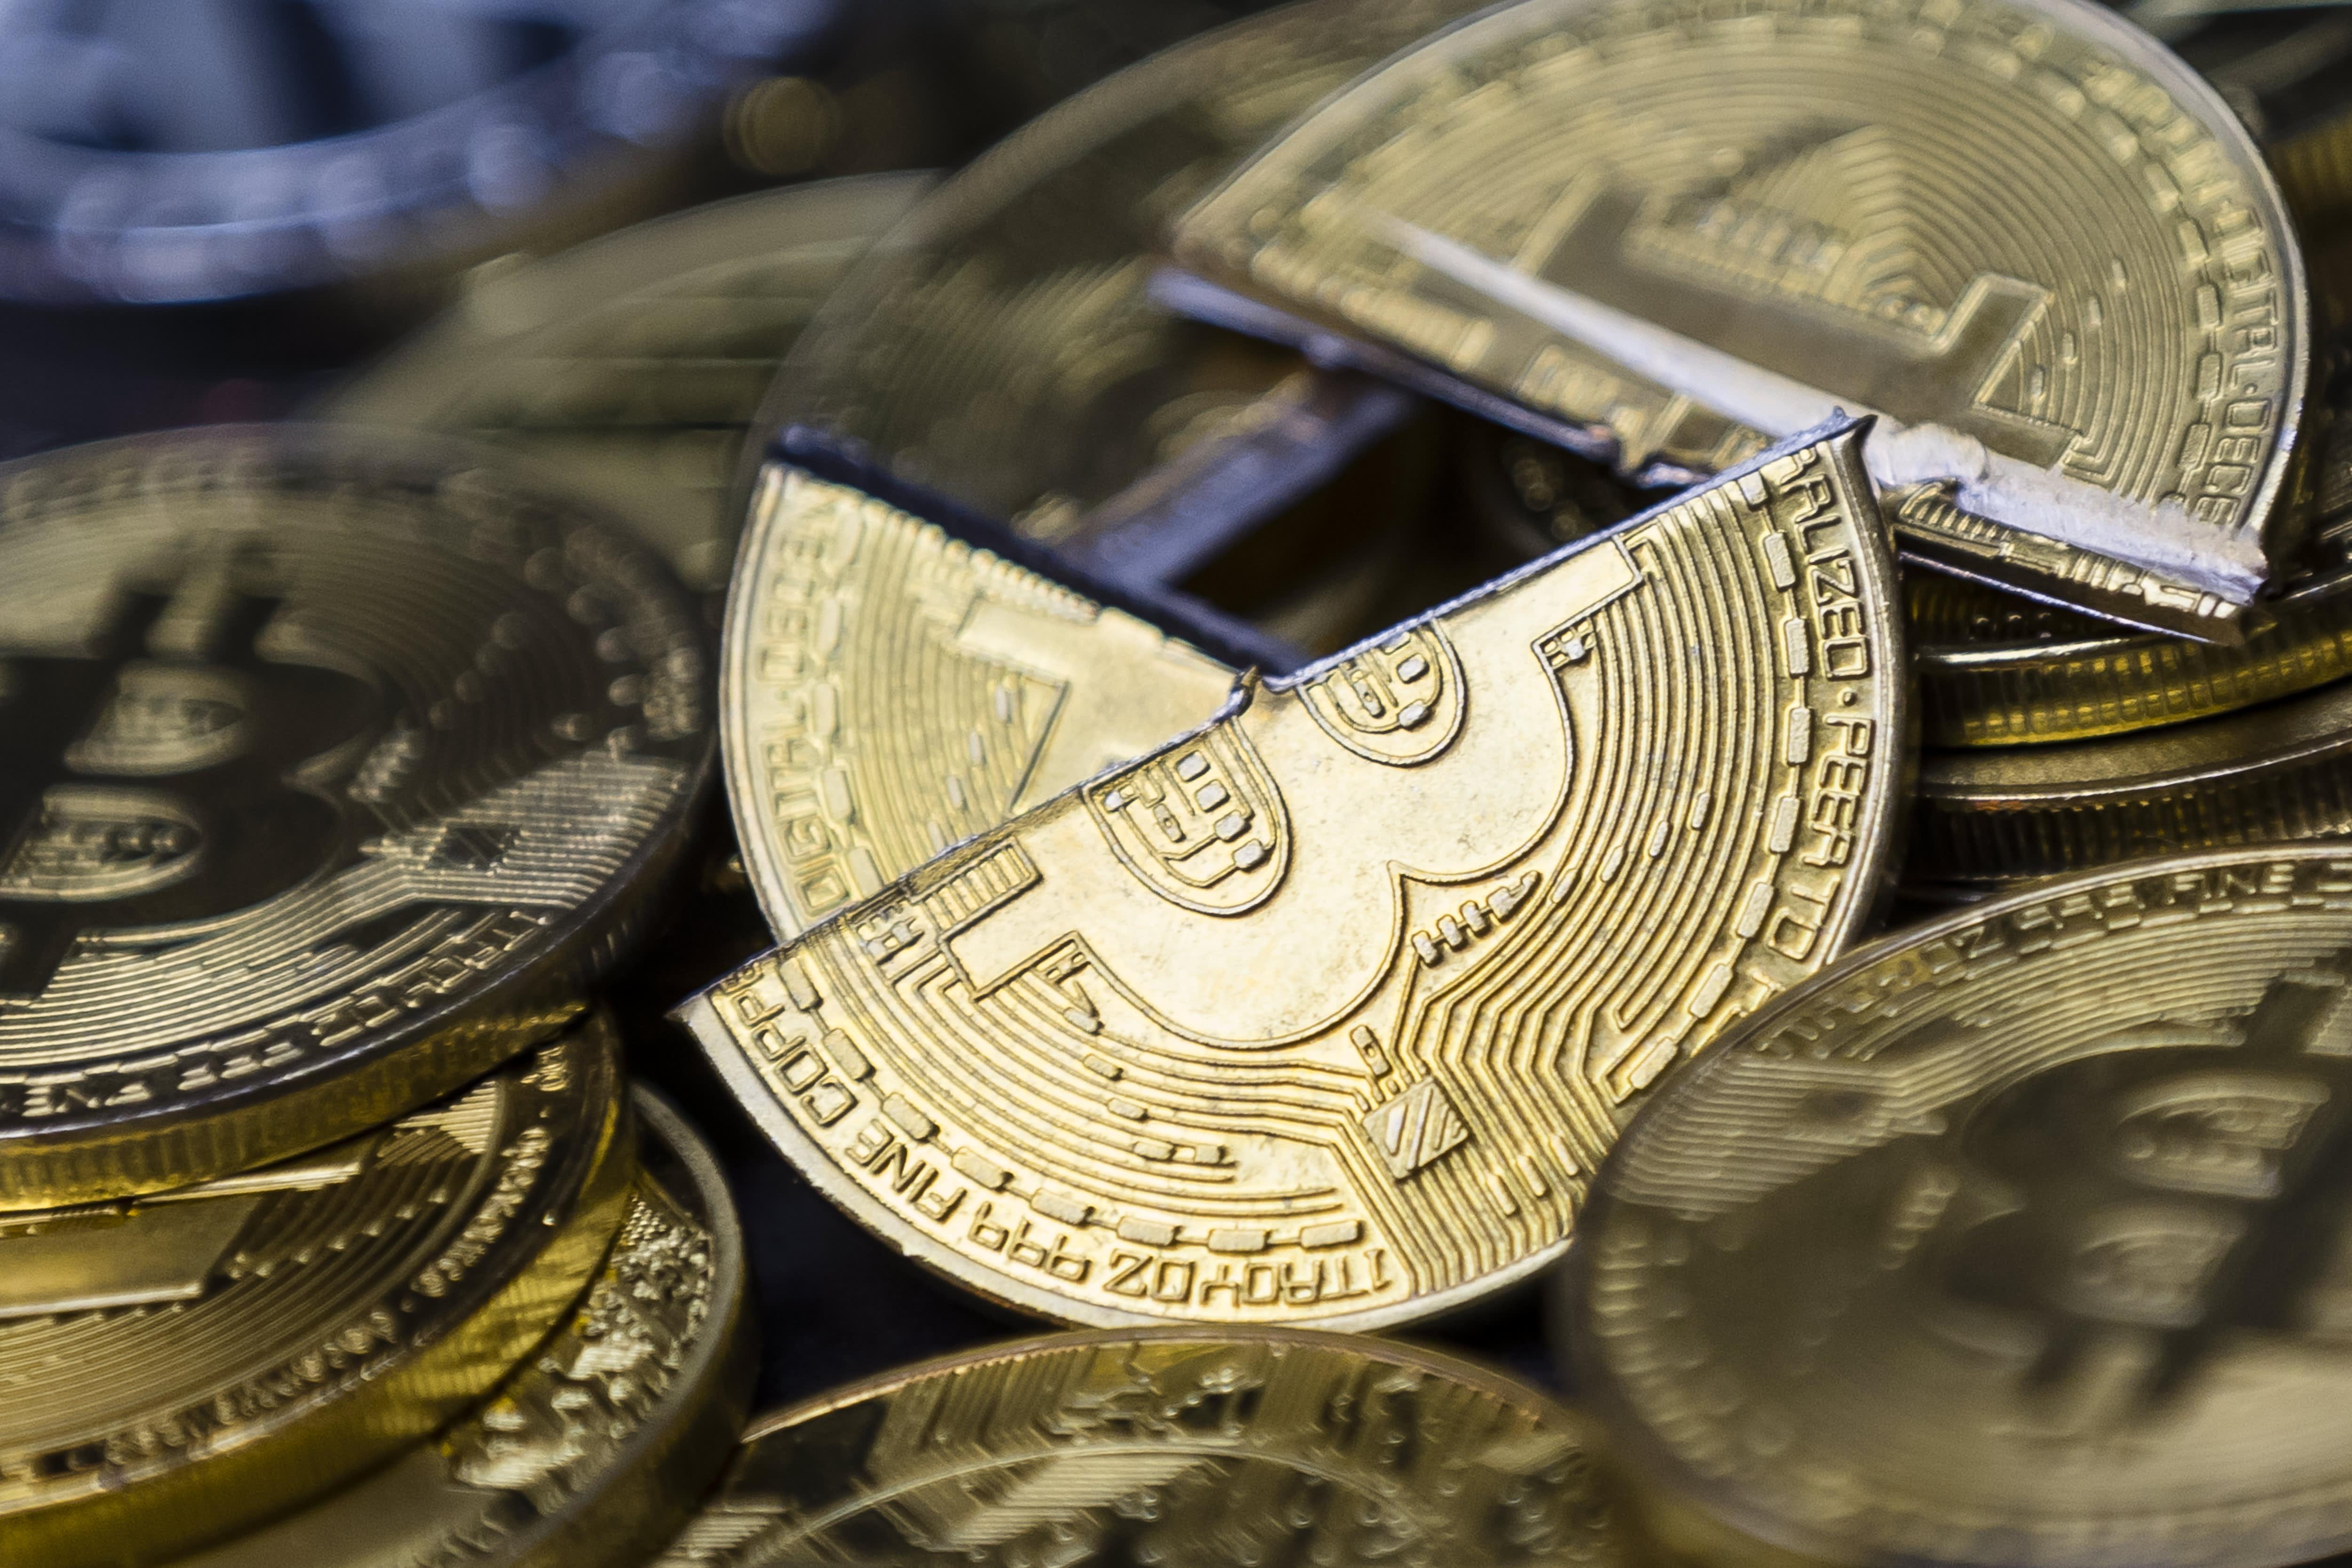 Bitcoin will go to zero': Davos talks up the future of